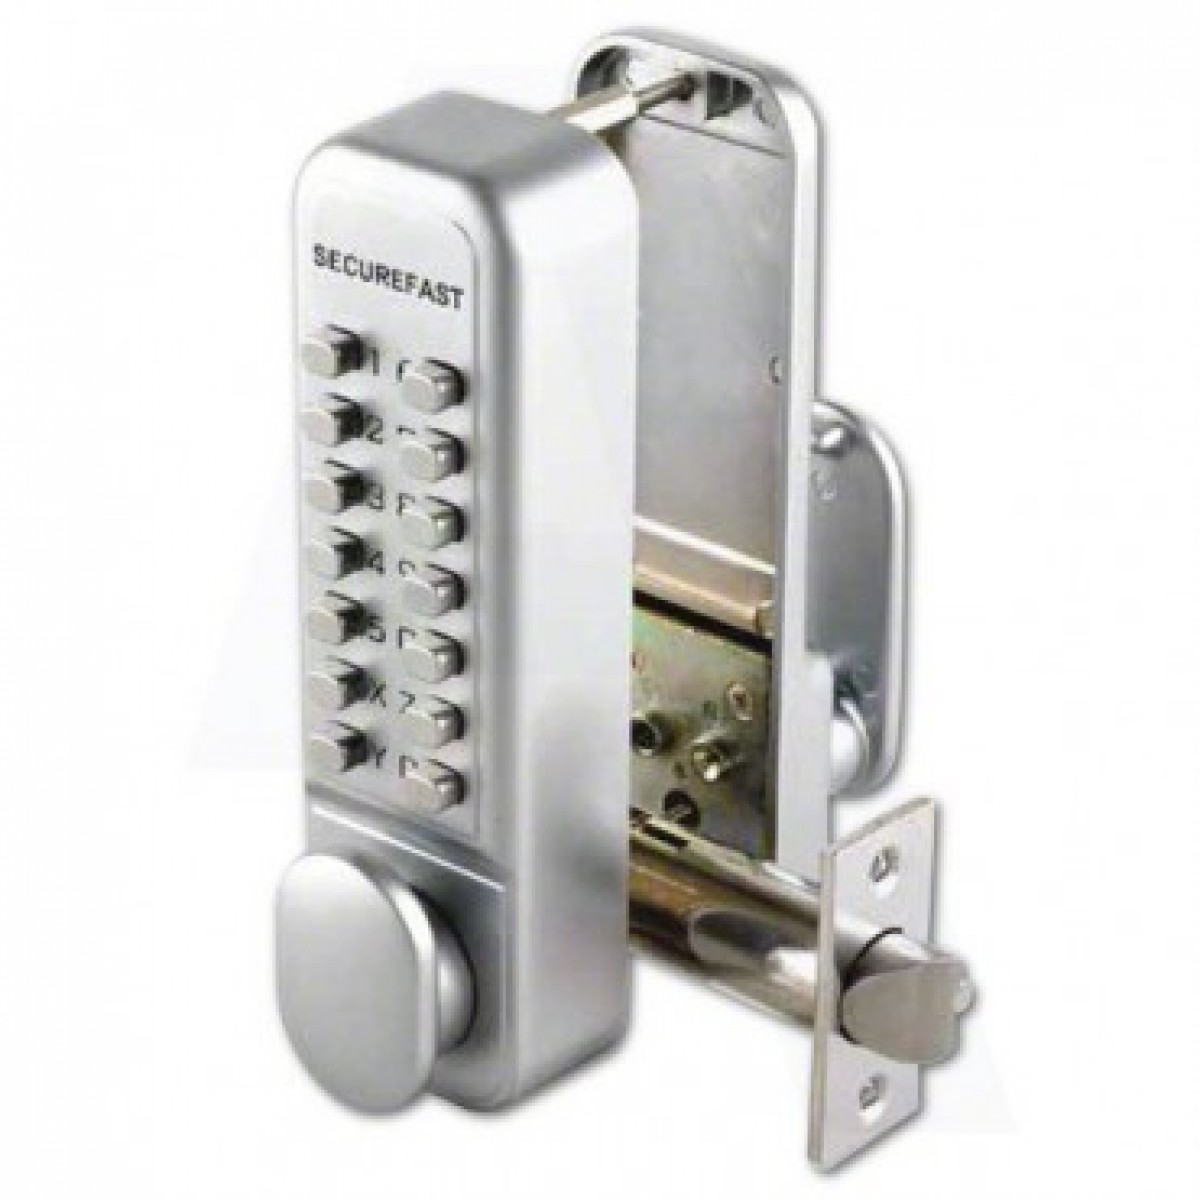 Securefast Digital Push On Door Lock Key Pad Code Combination Access